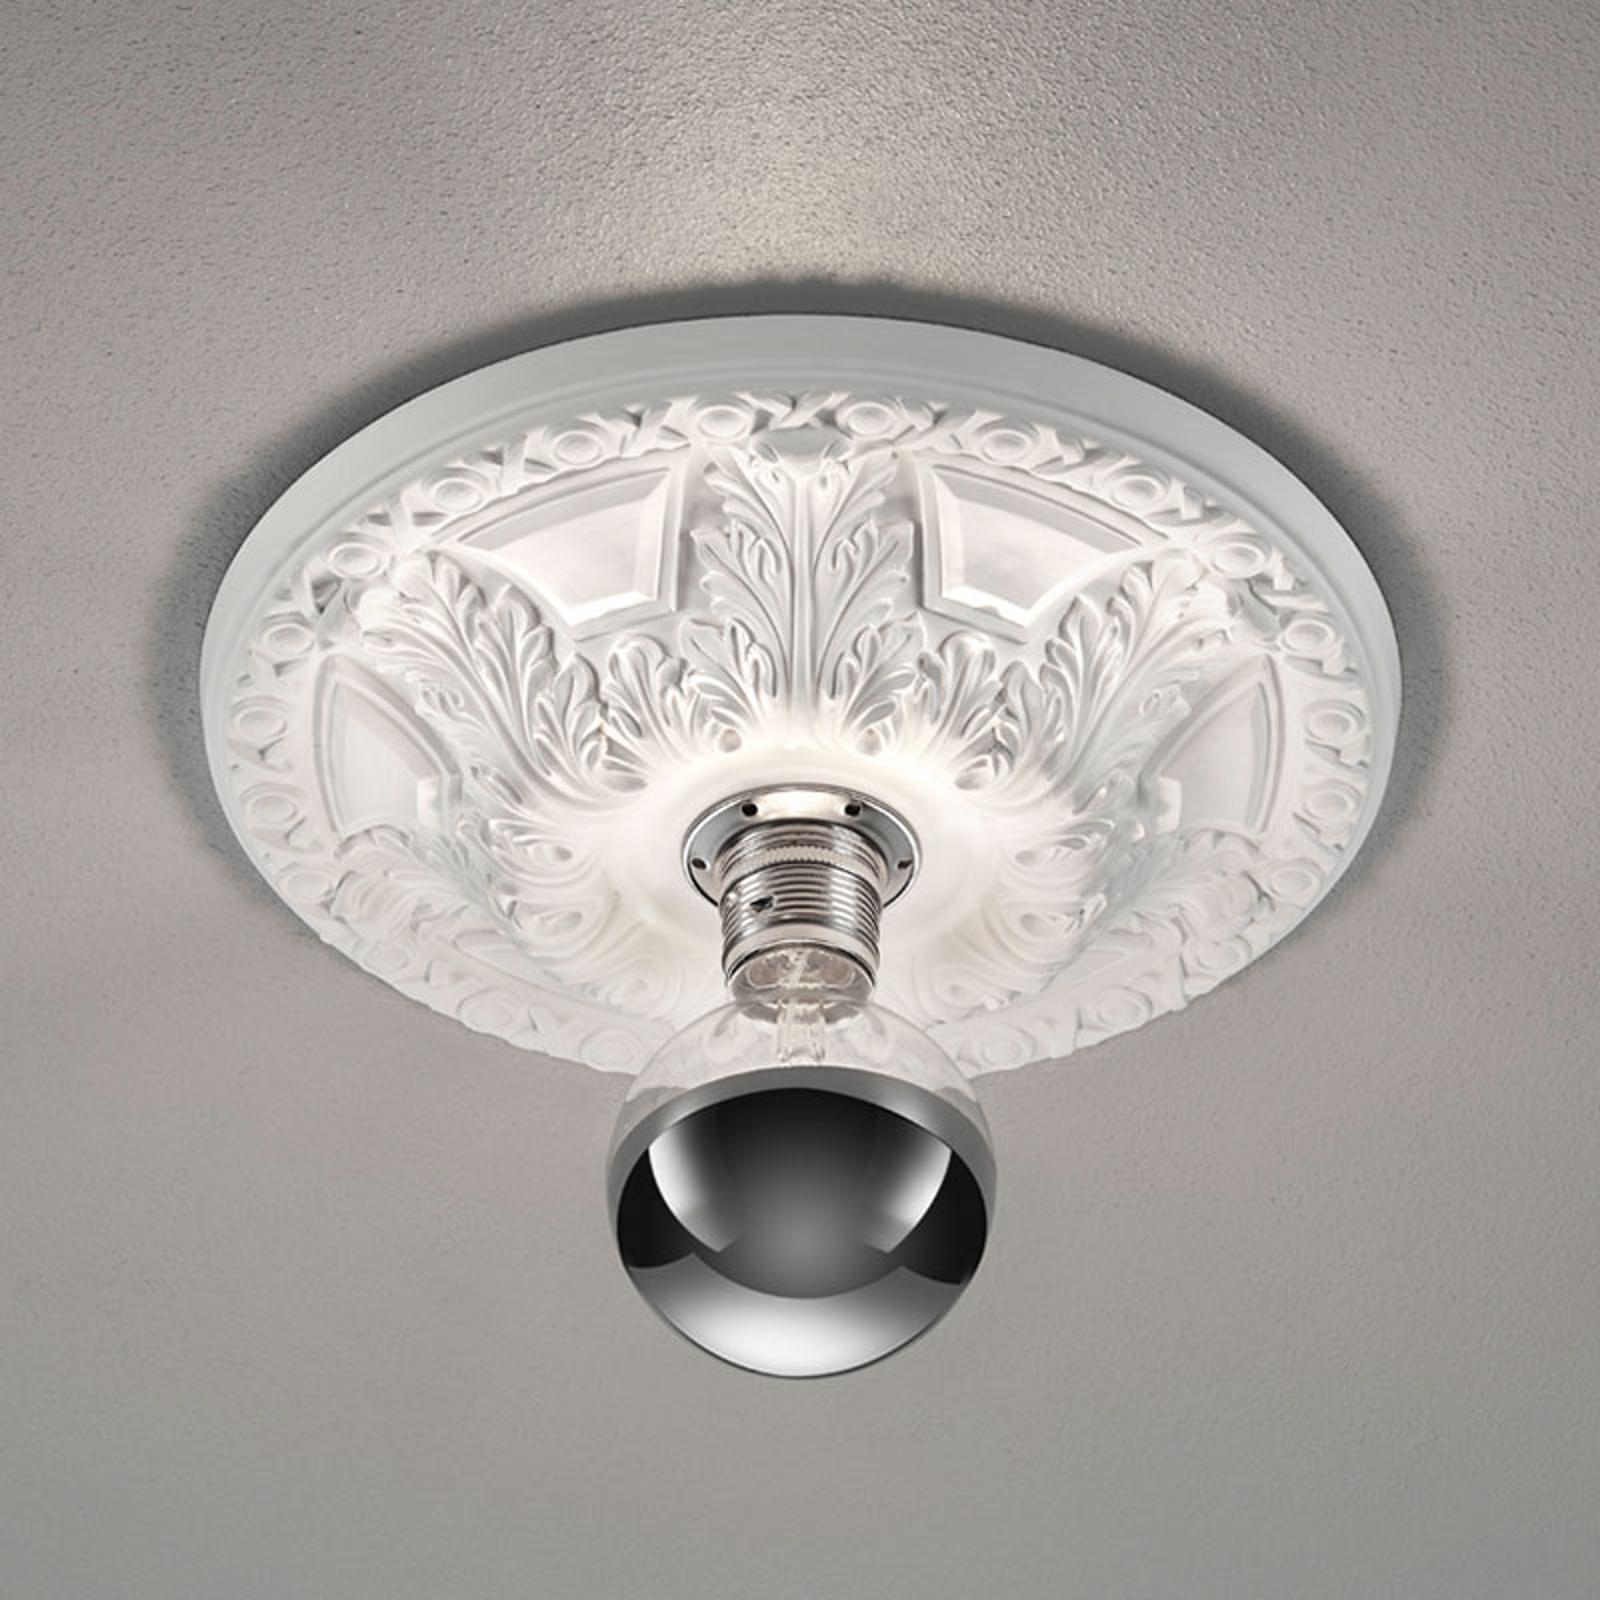 Deckenlampe Lilly, Gips, Stuckoptik Ø 55,5 cm